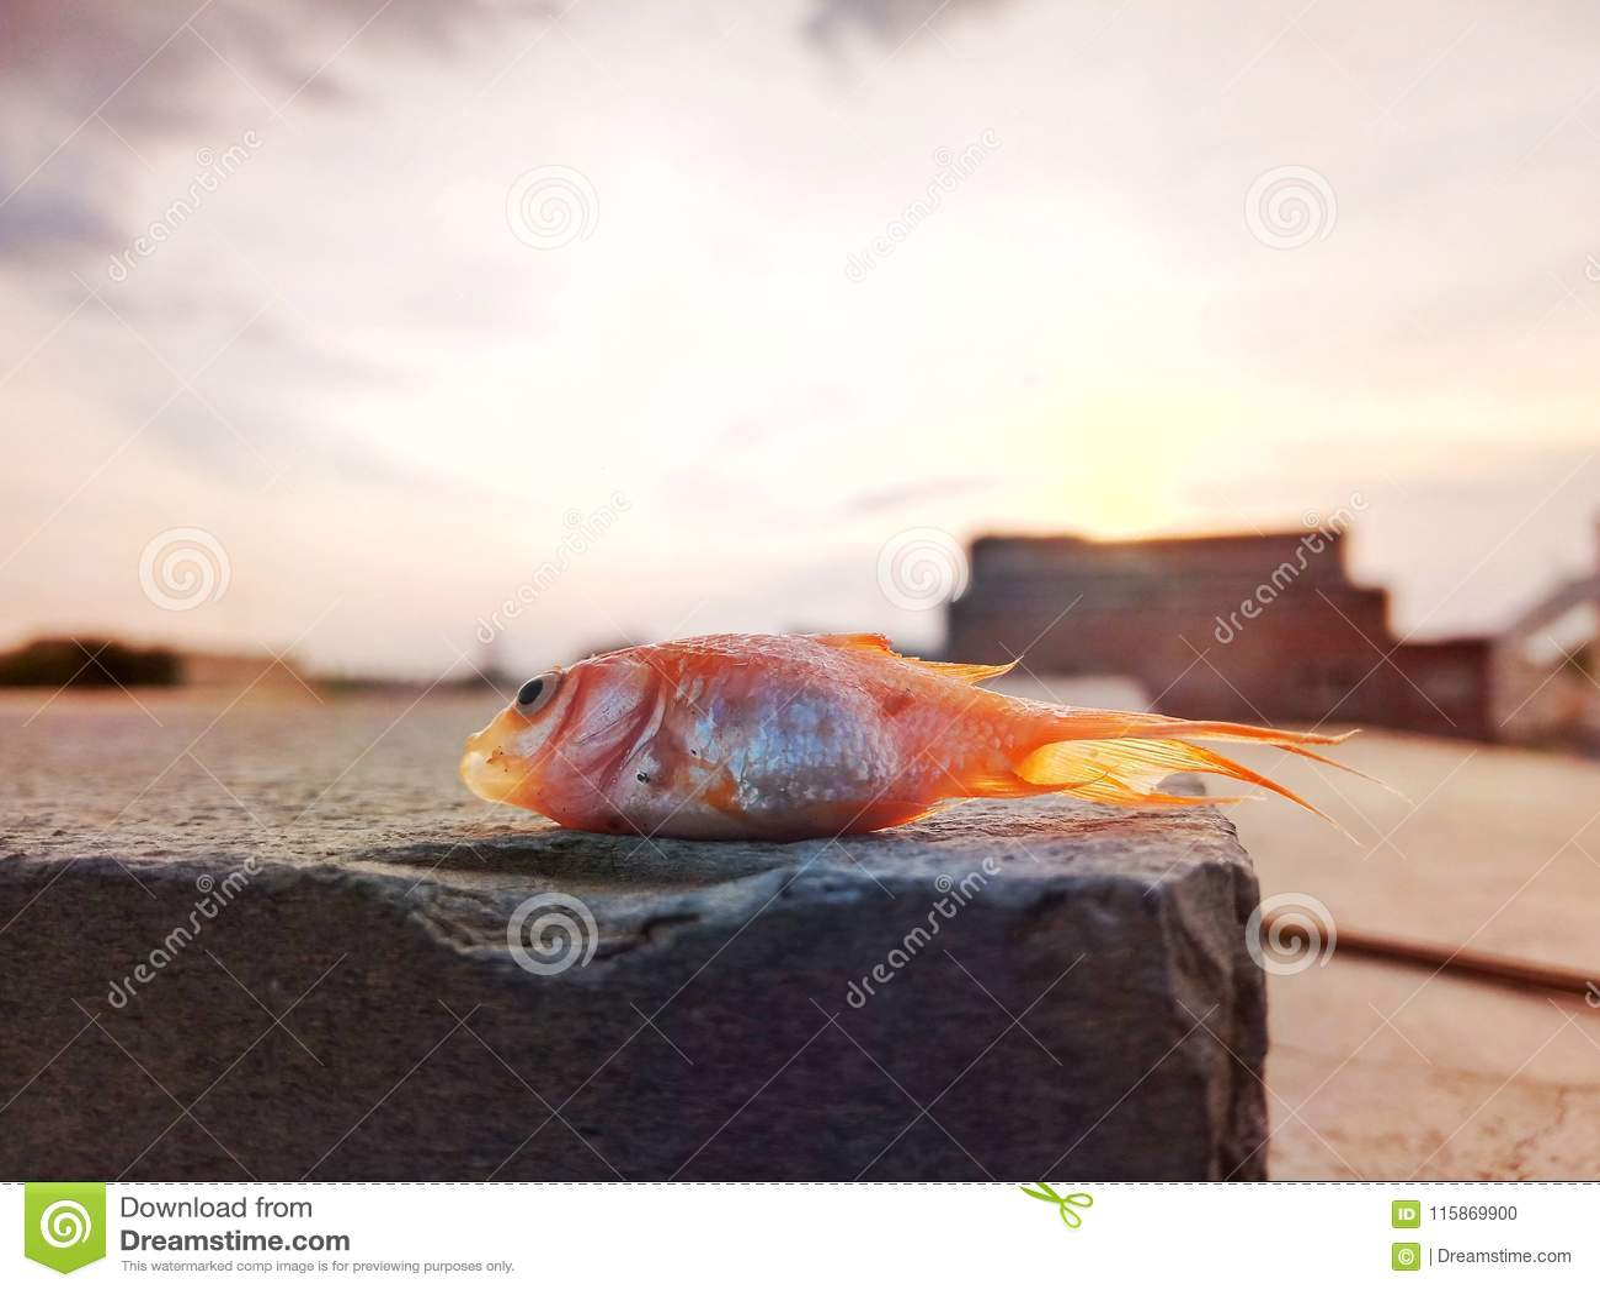 Dead gold fish